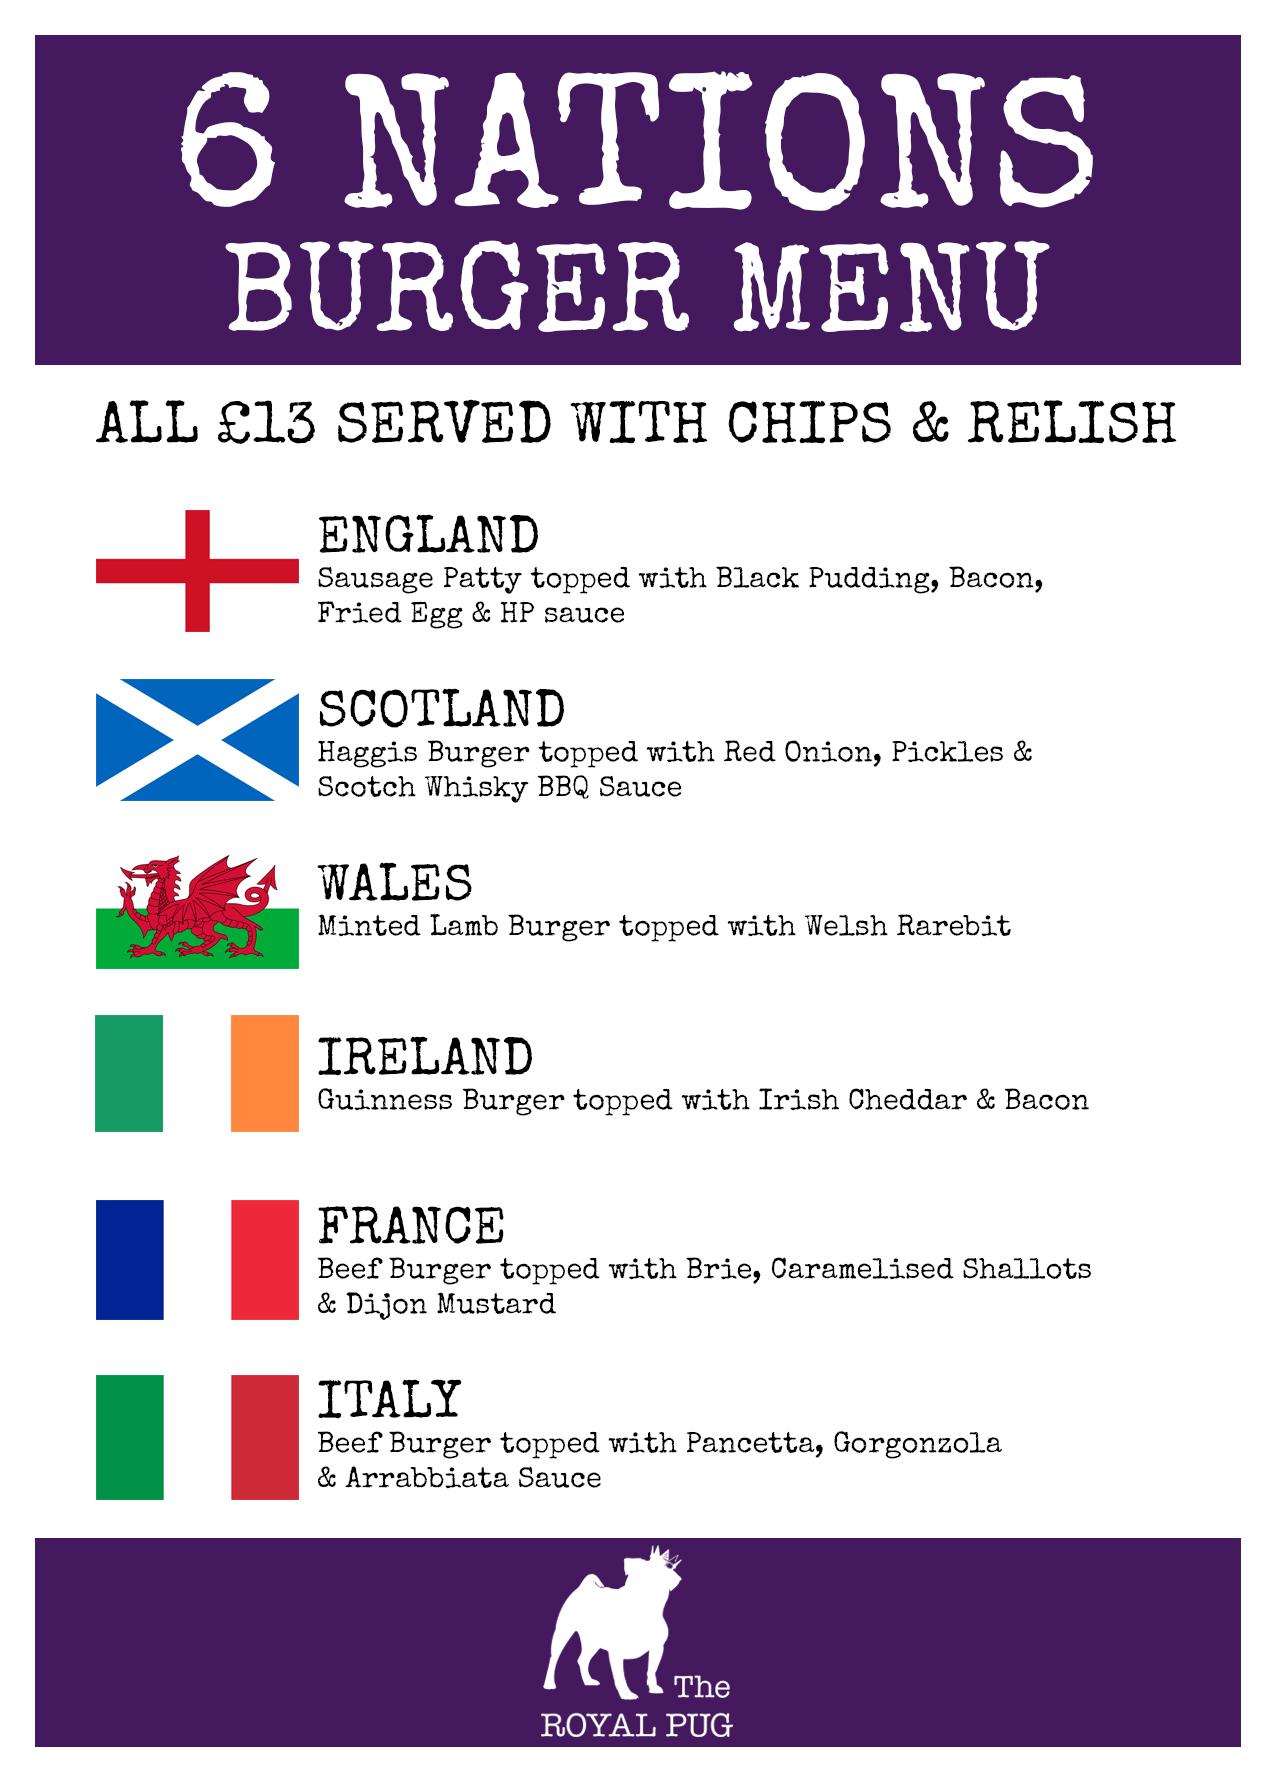 6 nations burger menu LR.jpg